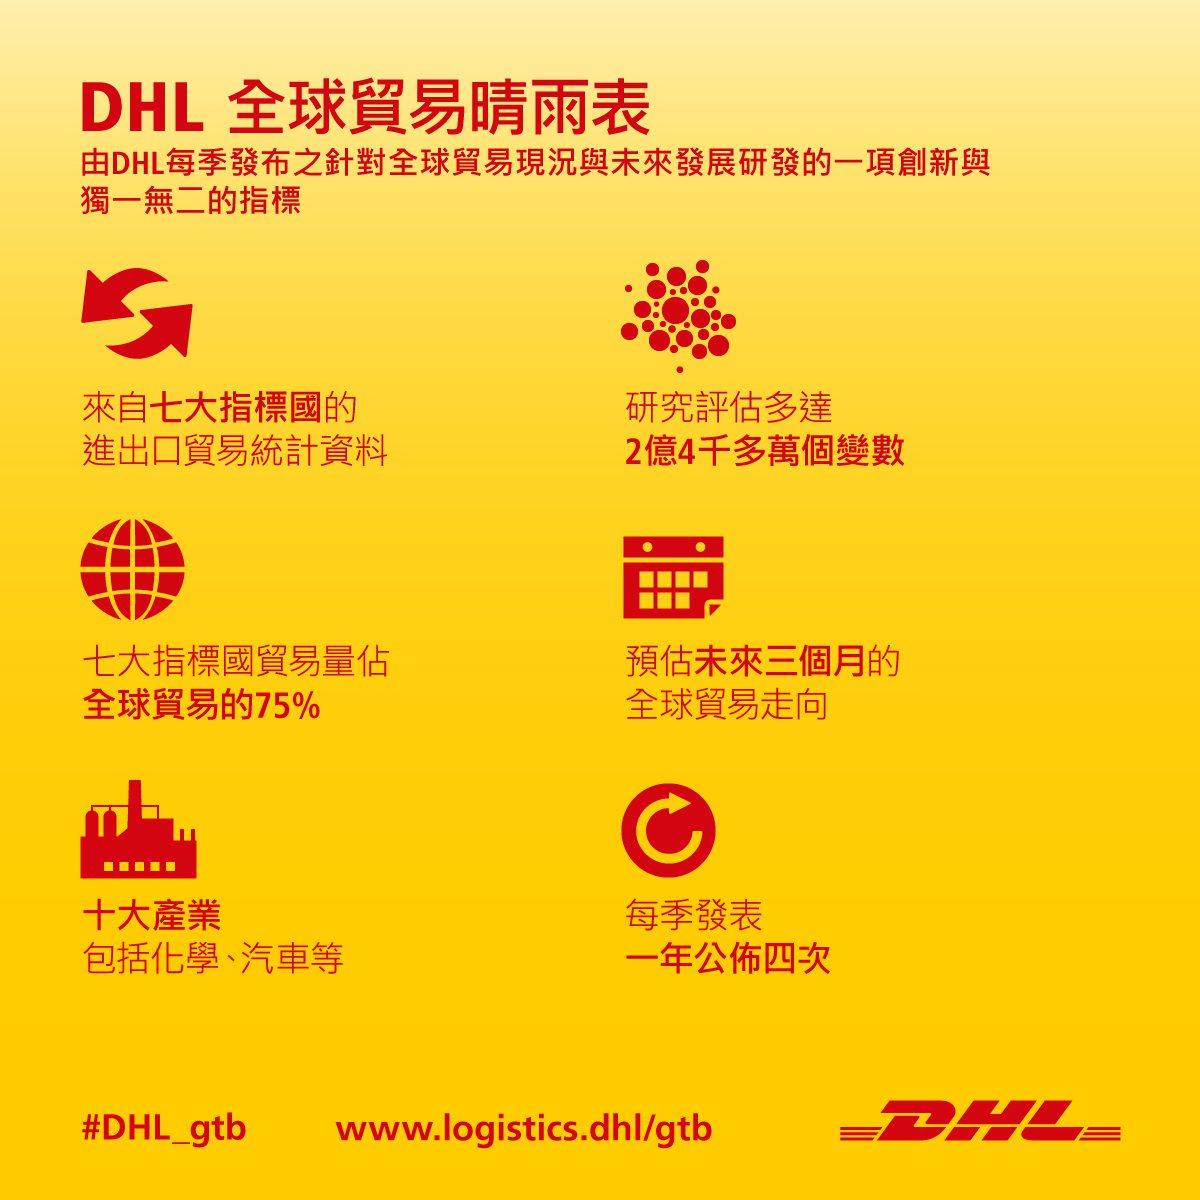 DHL全球貿易晴雨表( Global Trade Barometer;GTB)預...